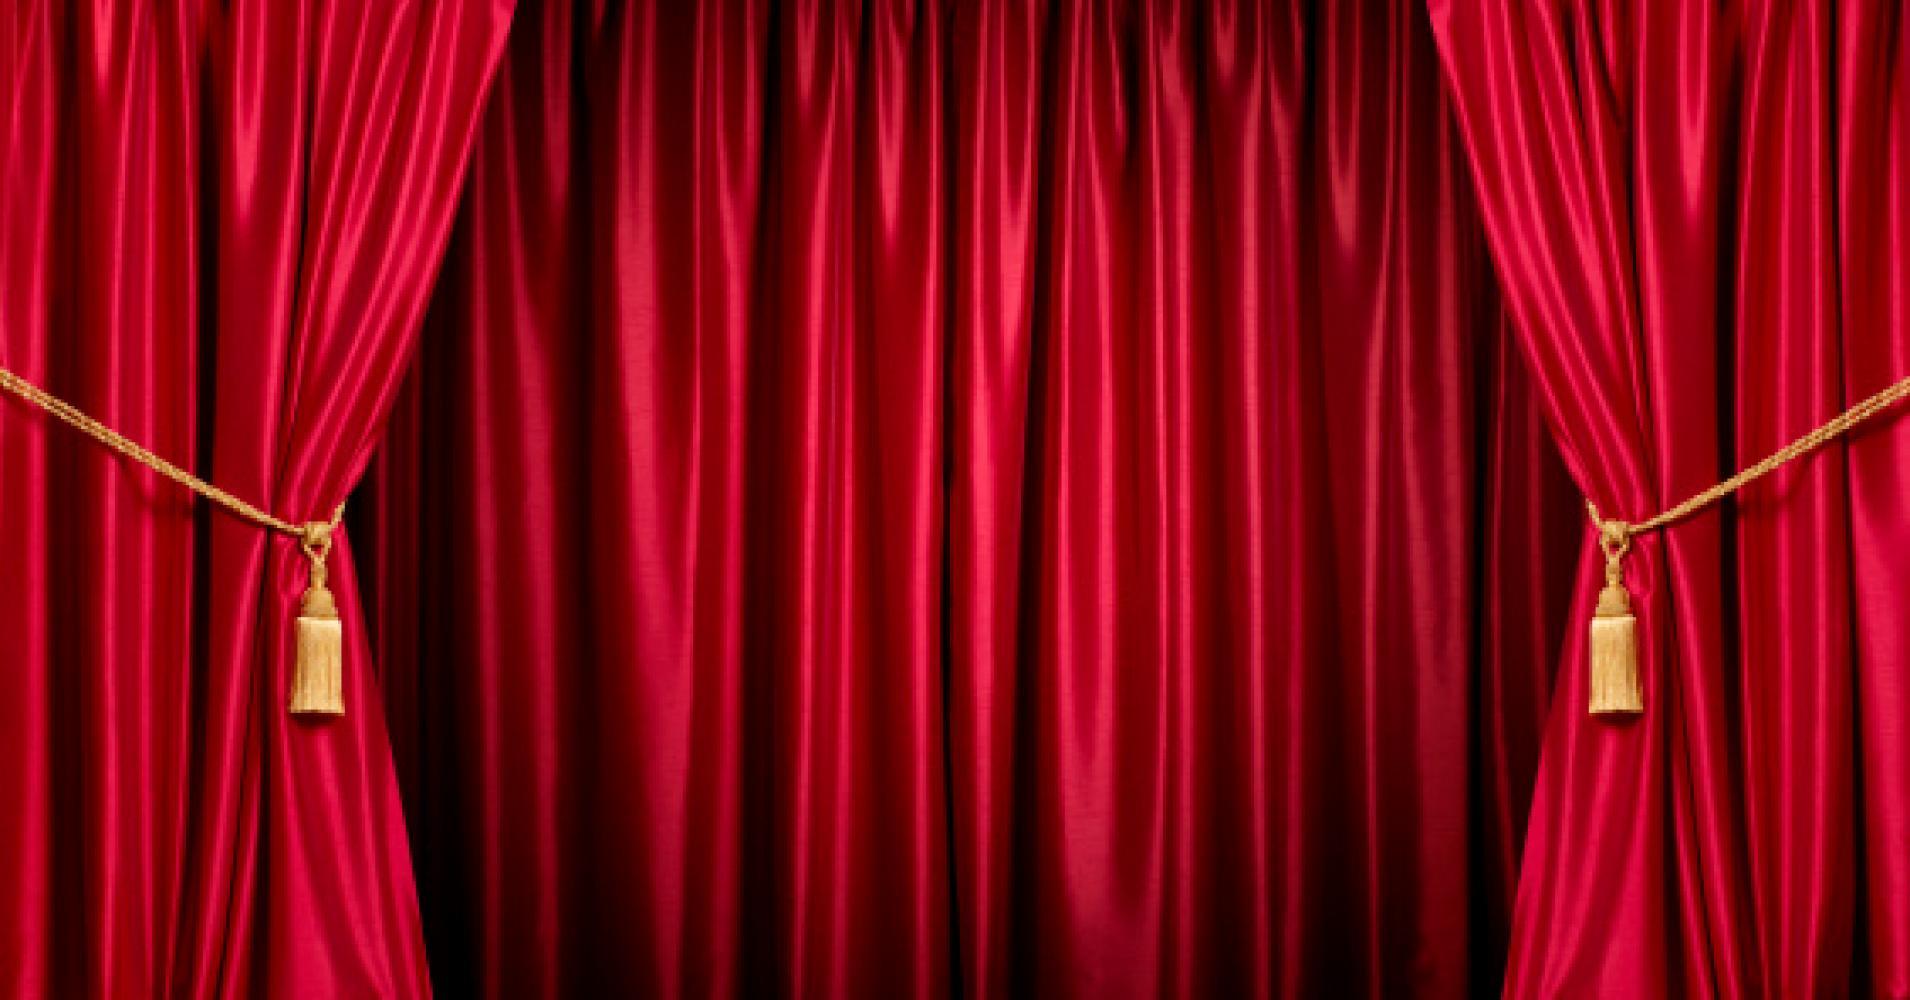 Curtain clipart curtain raiser Curtain Investment Rising  on